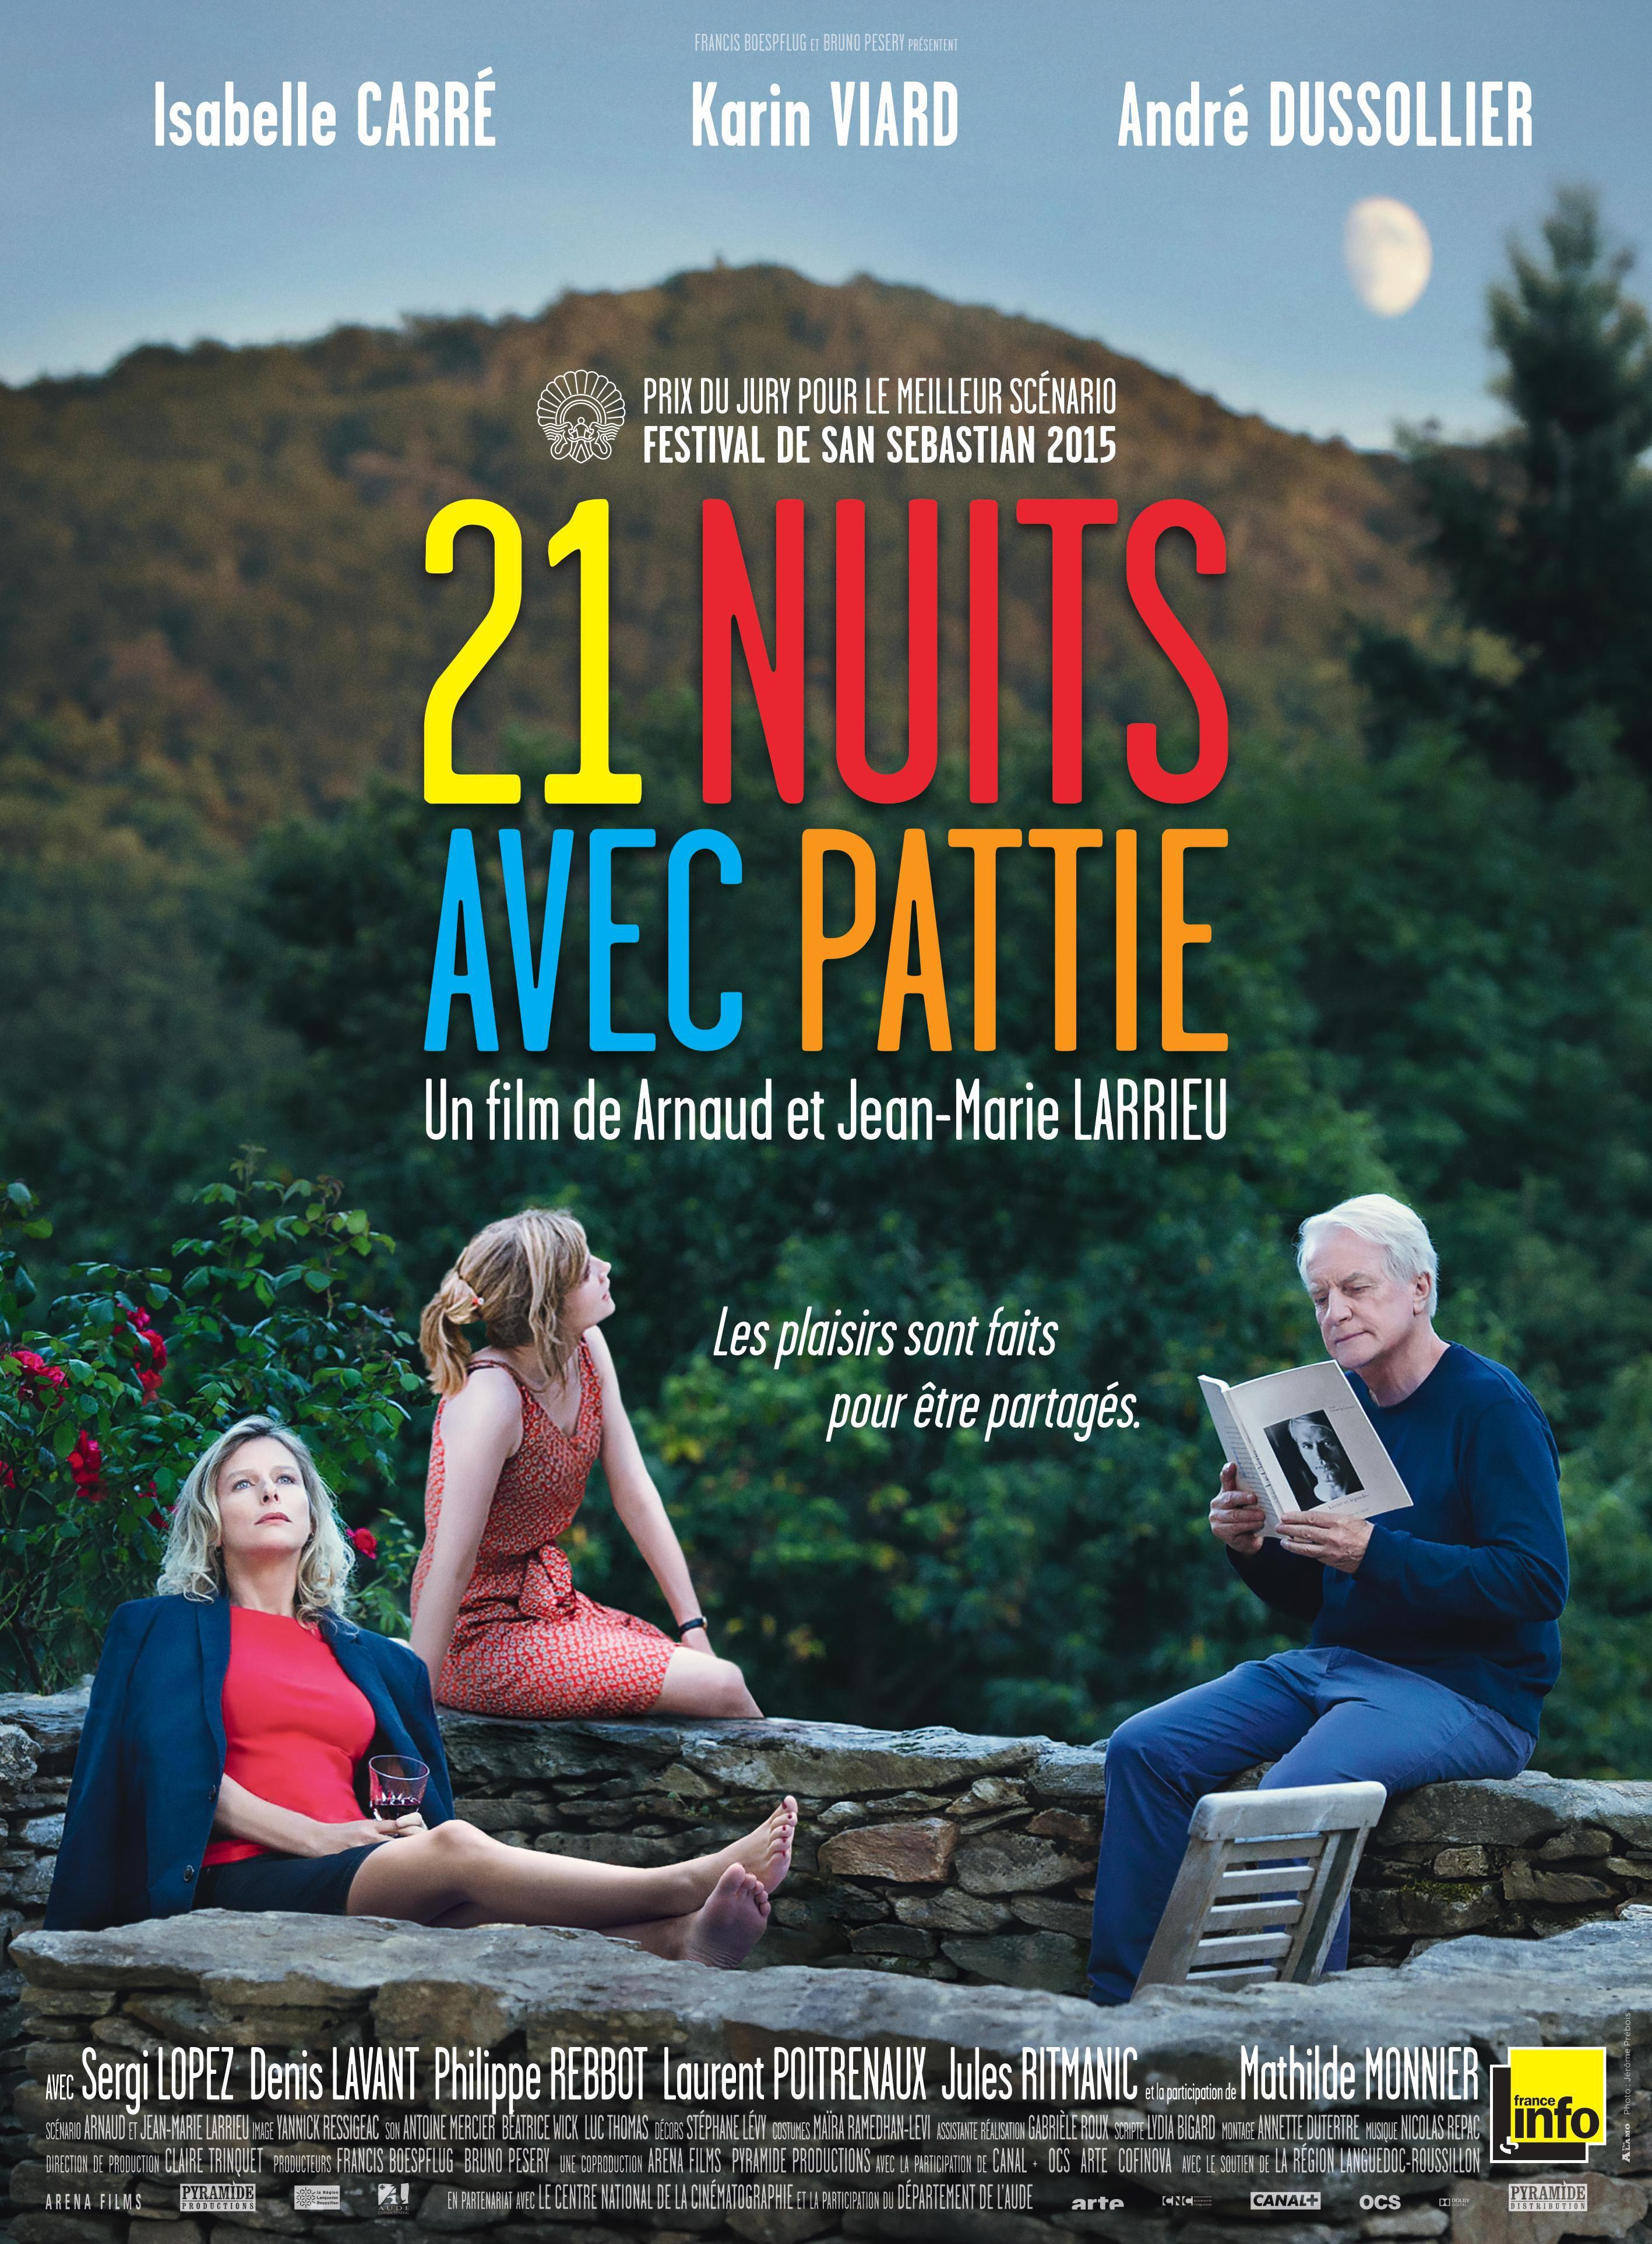 21 nuits avec Pattie - Film (2015)